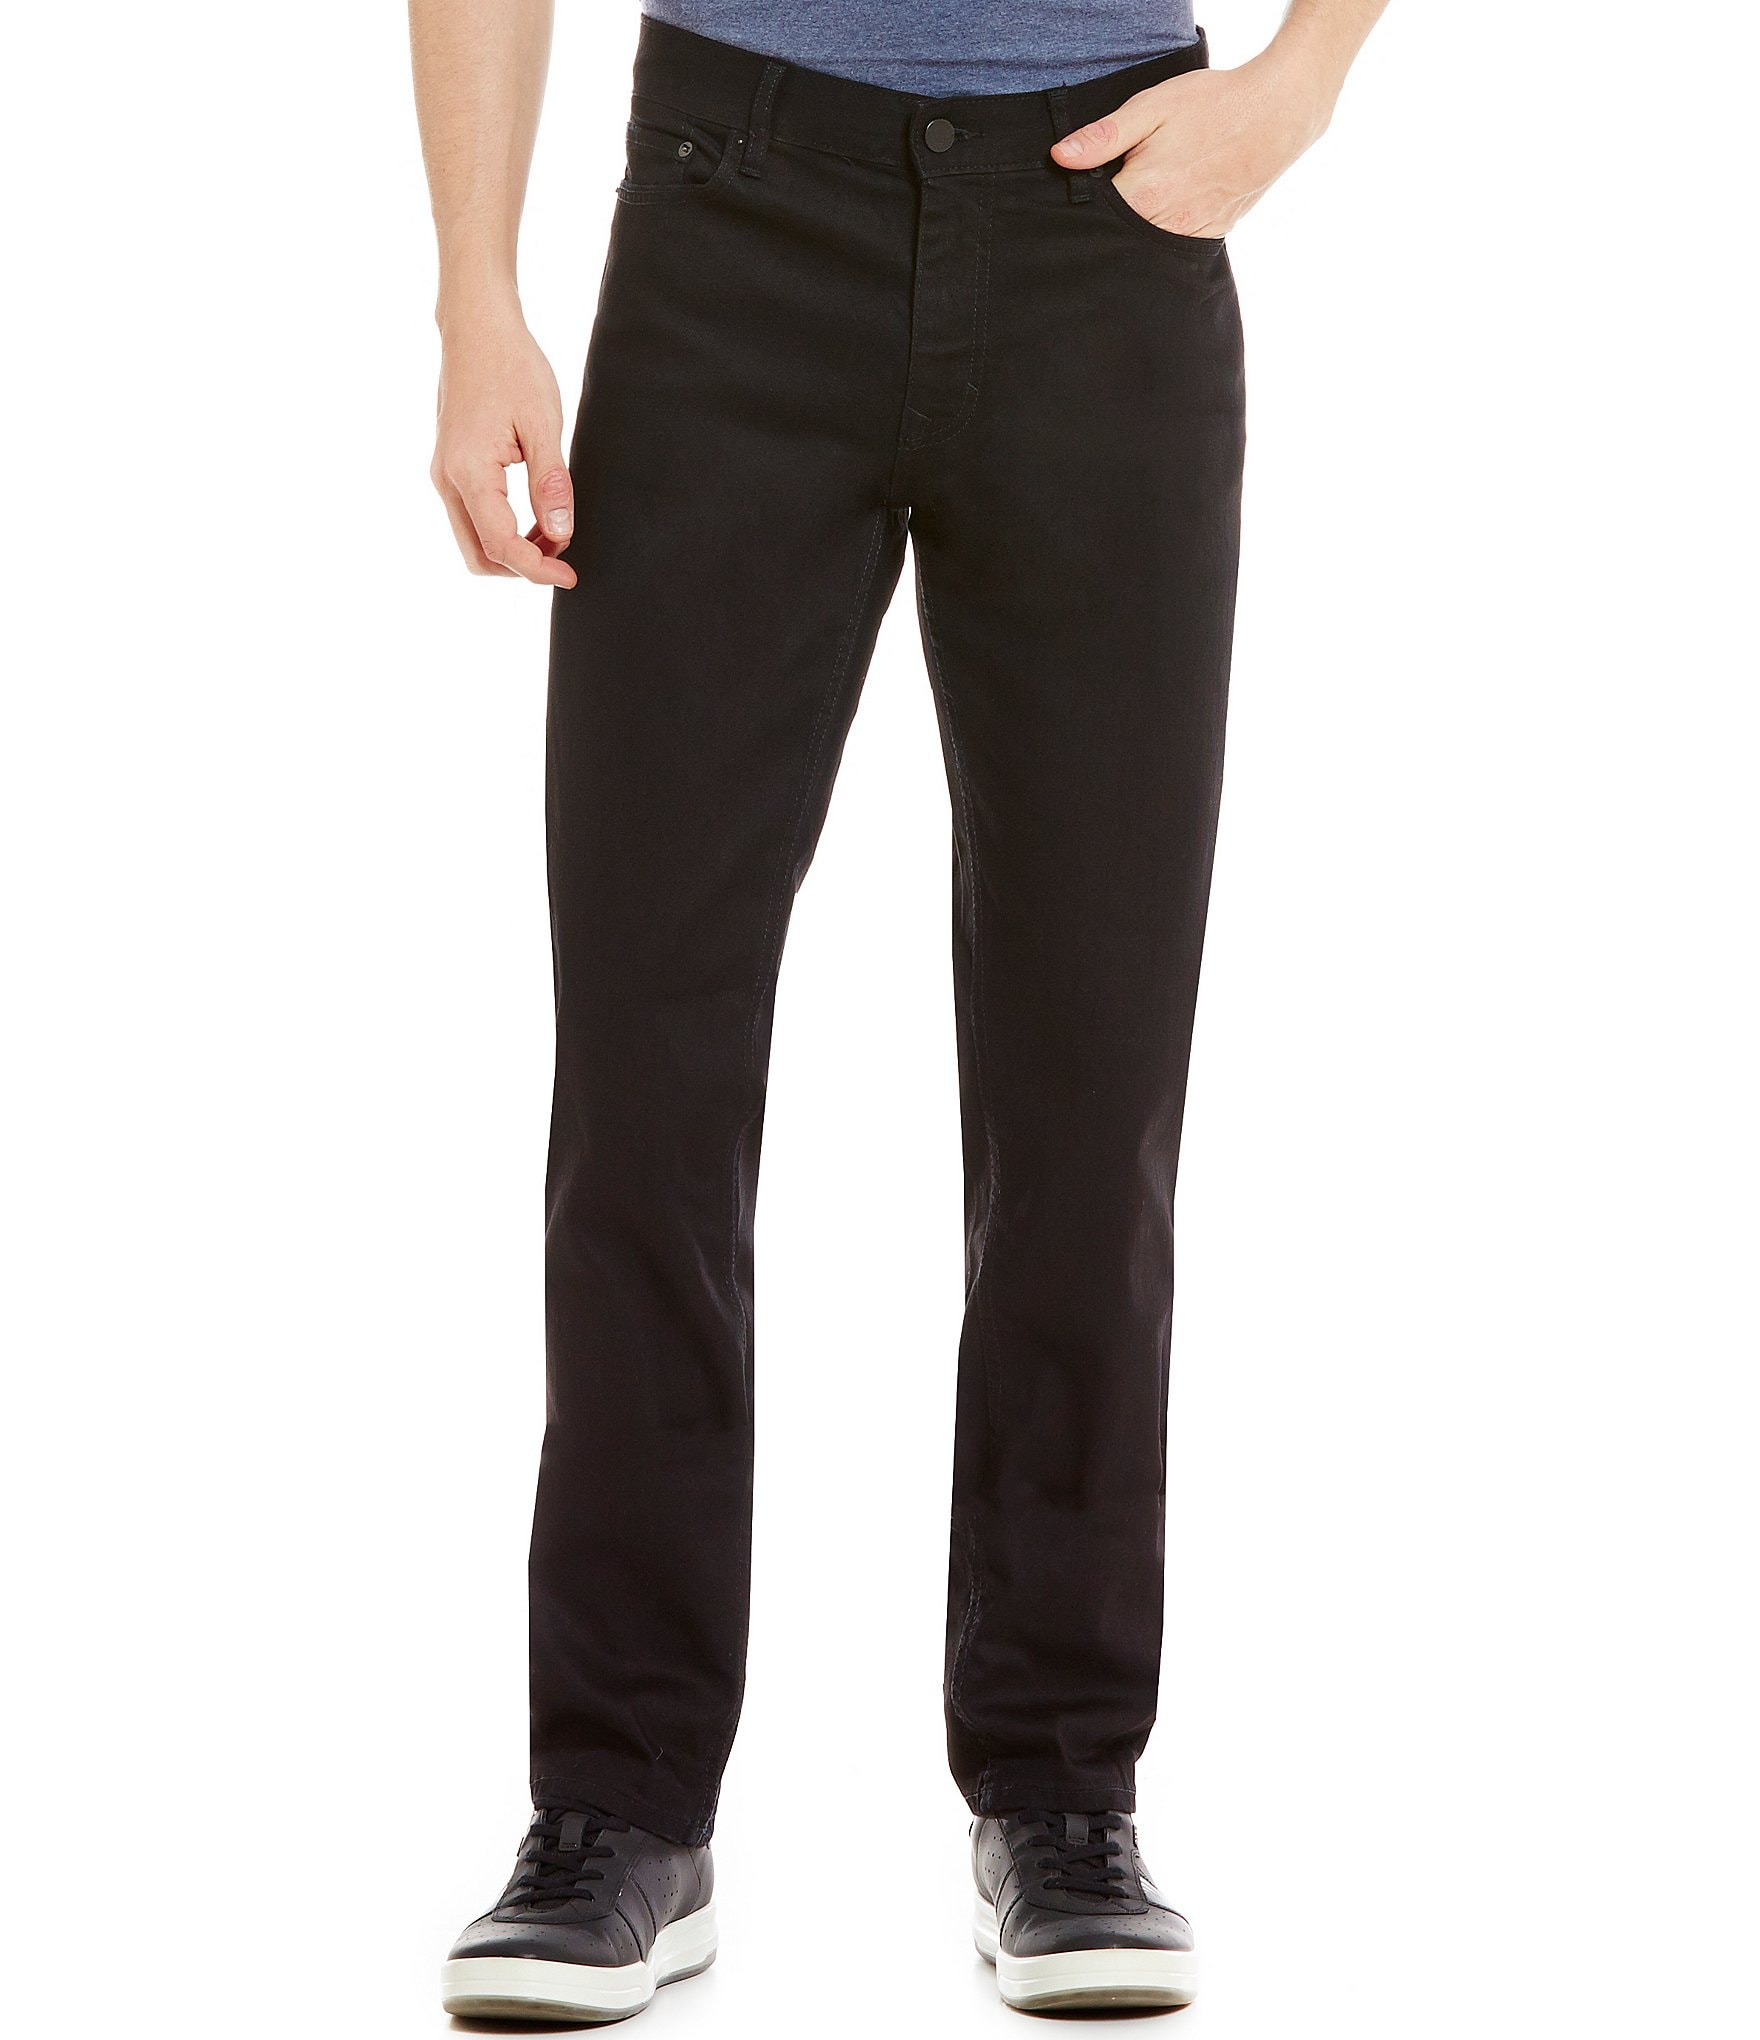 calvin klein jeans slim straight jeans dillards. Black Bedroom Furniture Sets. Home Design Ideas